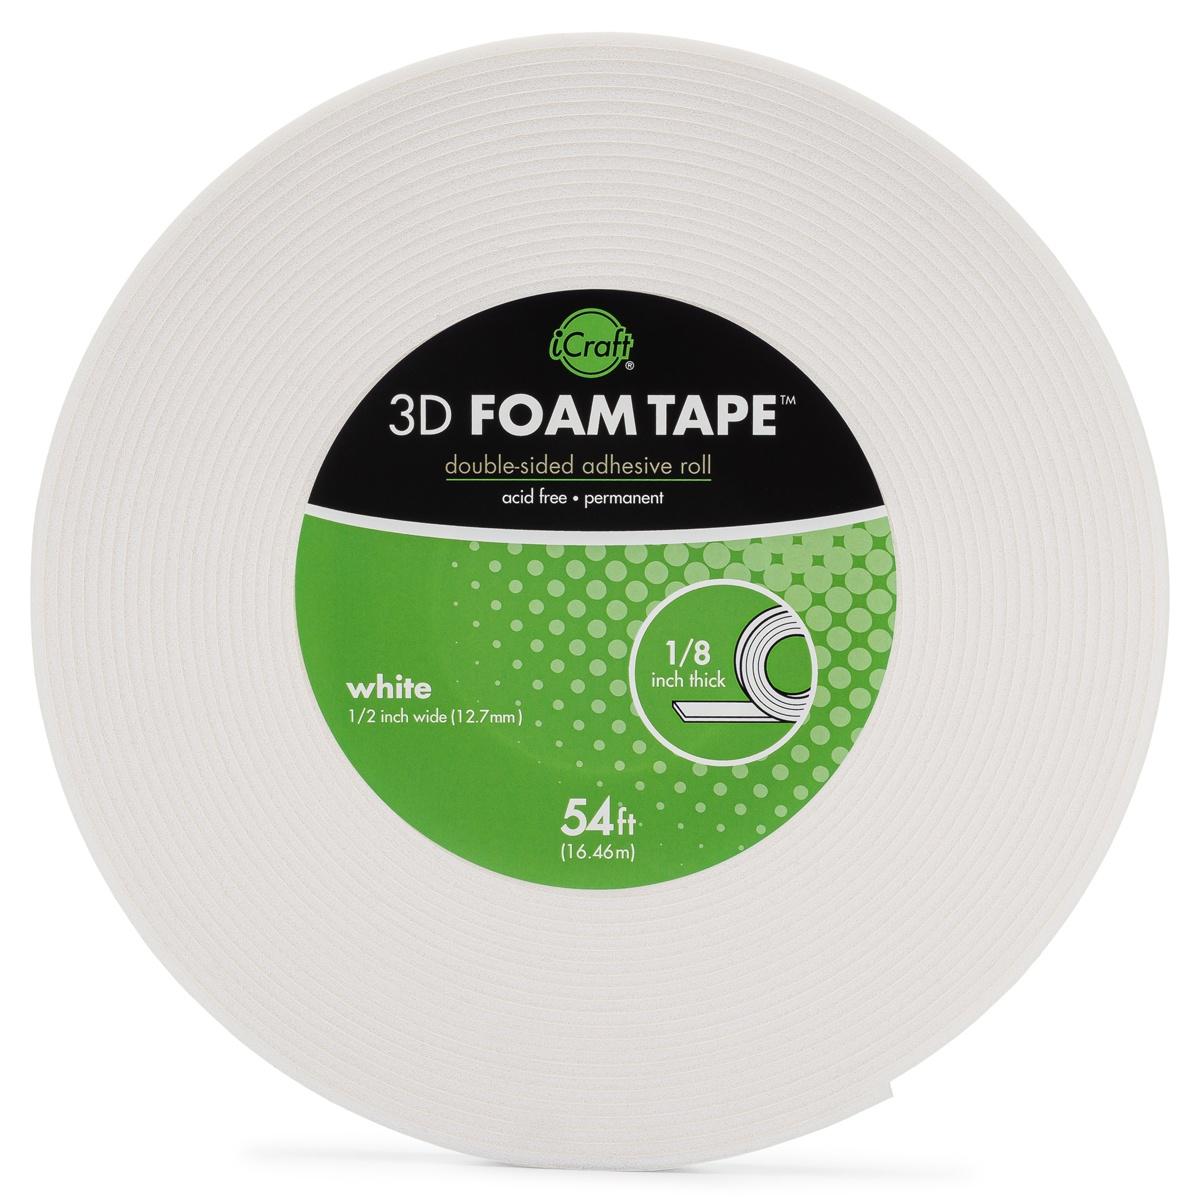 iCraft 3D Foam Tape Roll-White .5X54'